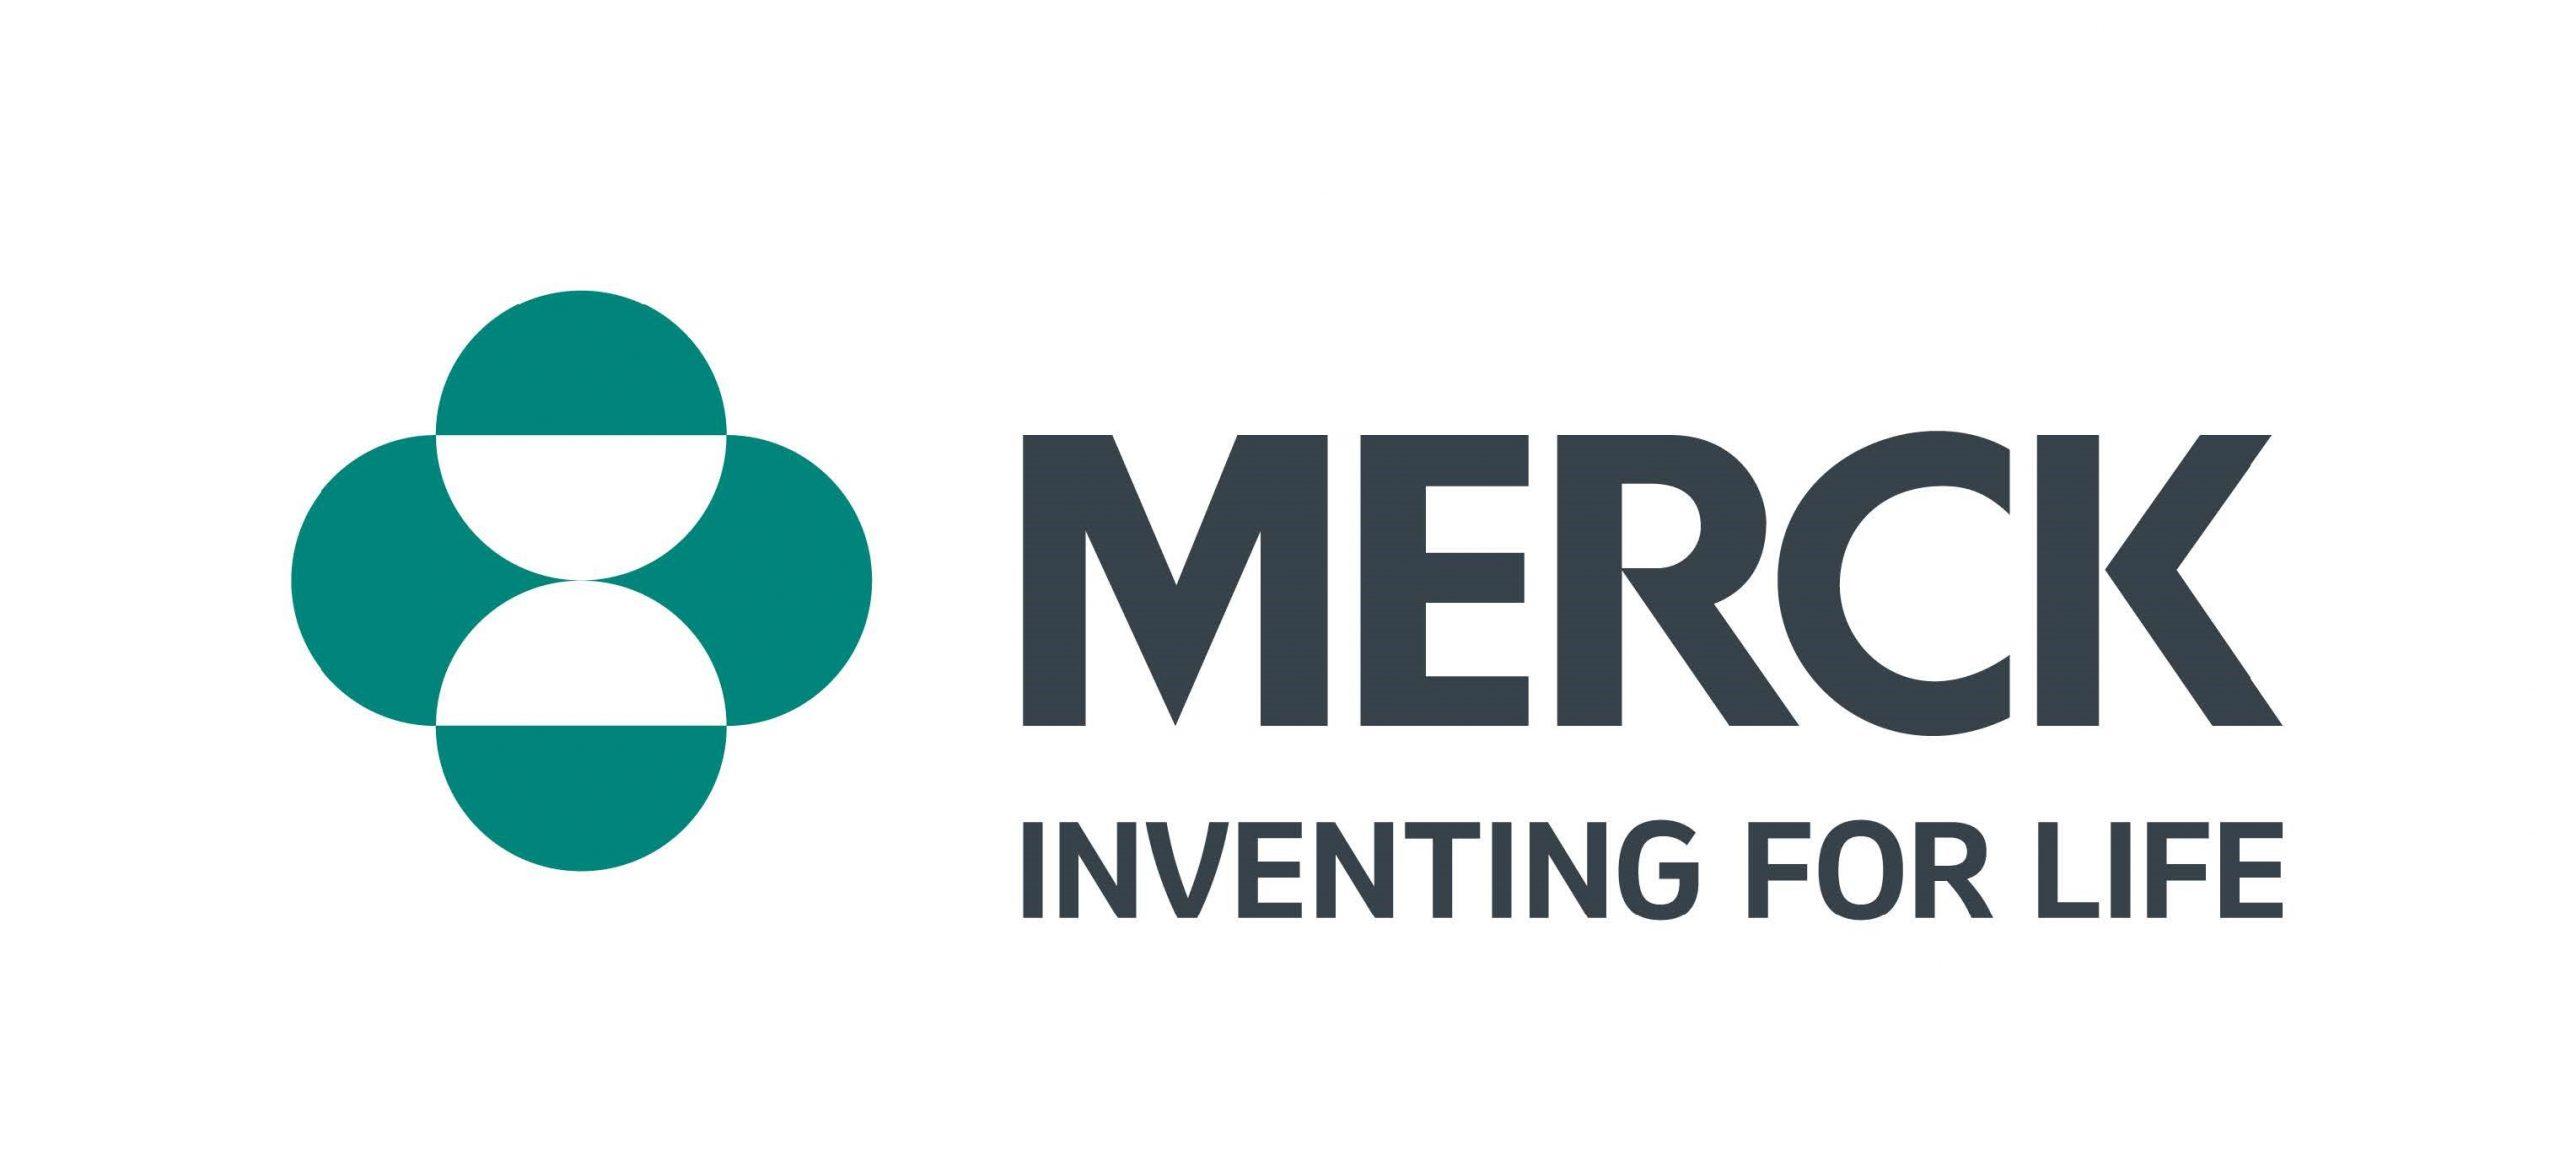 Merck - Inventing for Life